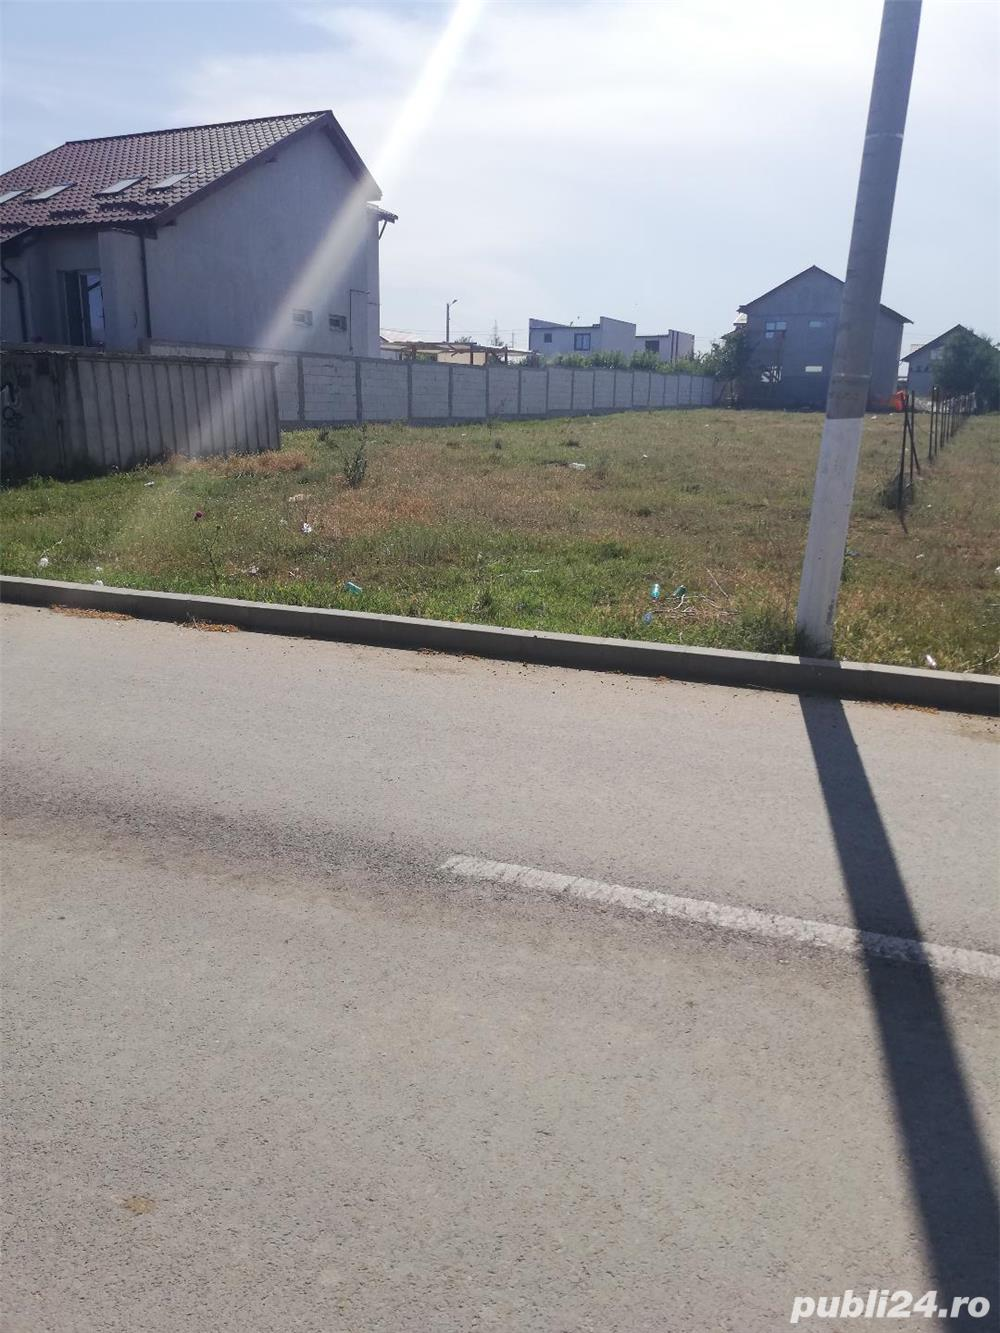 VAND 1000 MP TEREN INTRAVILAN, ZONA VILE (  16 KM DE CONSTANTA ), 69 EURO MP NEGOCIABIL